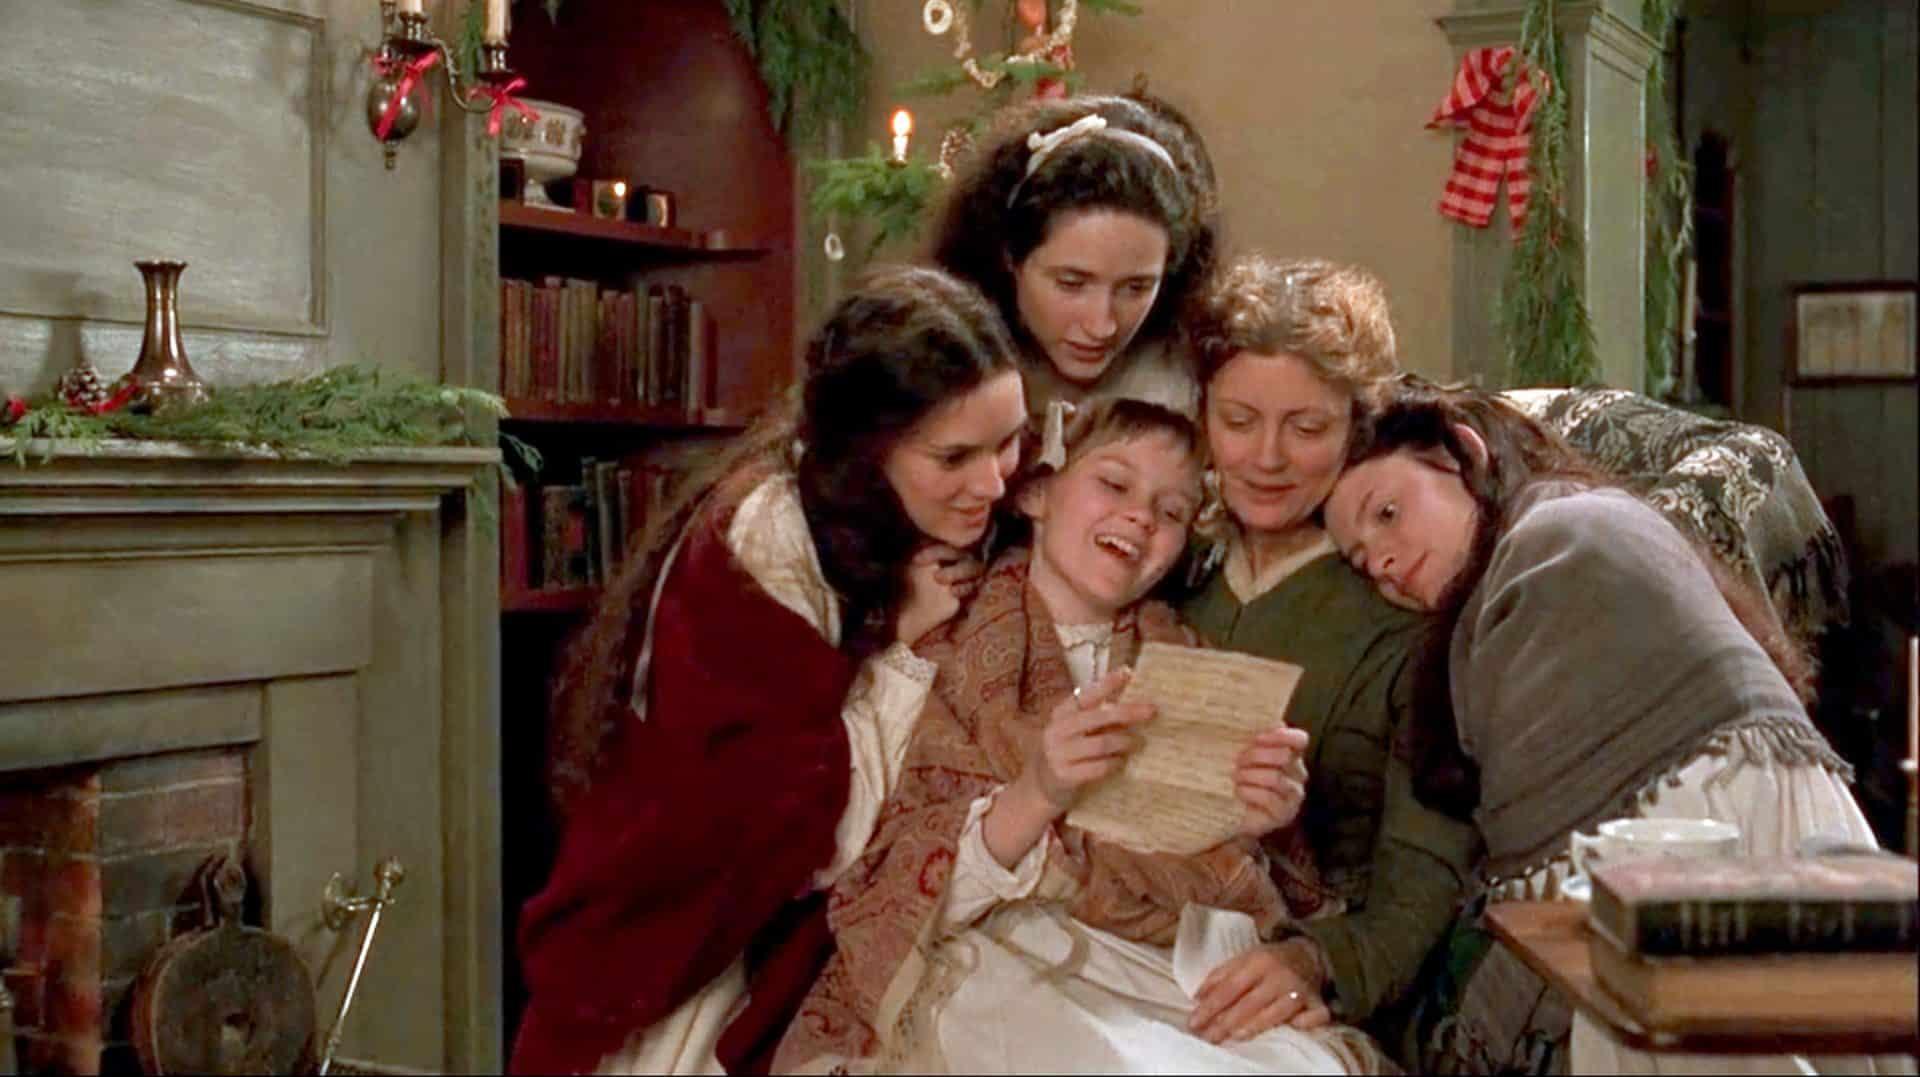 The Christmas Spirit Of The 1994 Little Women The Spool